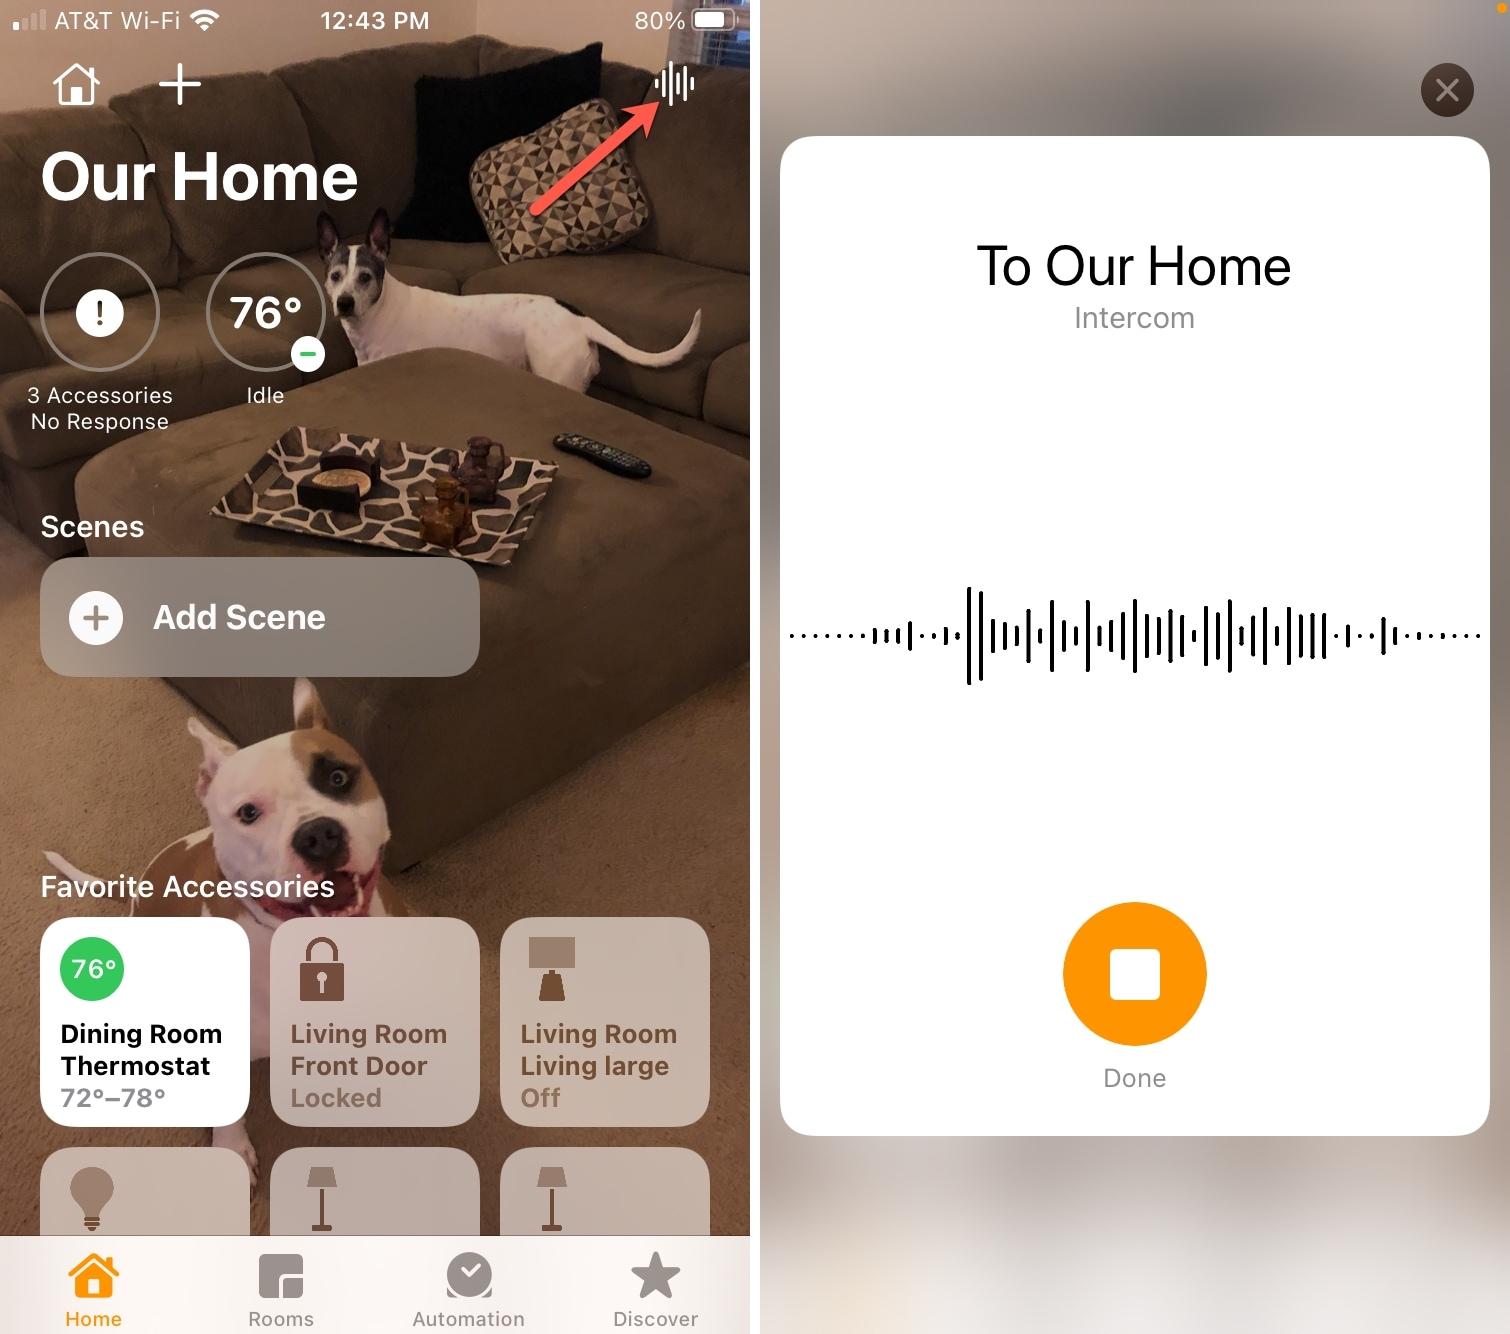 Send Intercom Message in the Home app